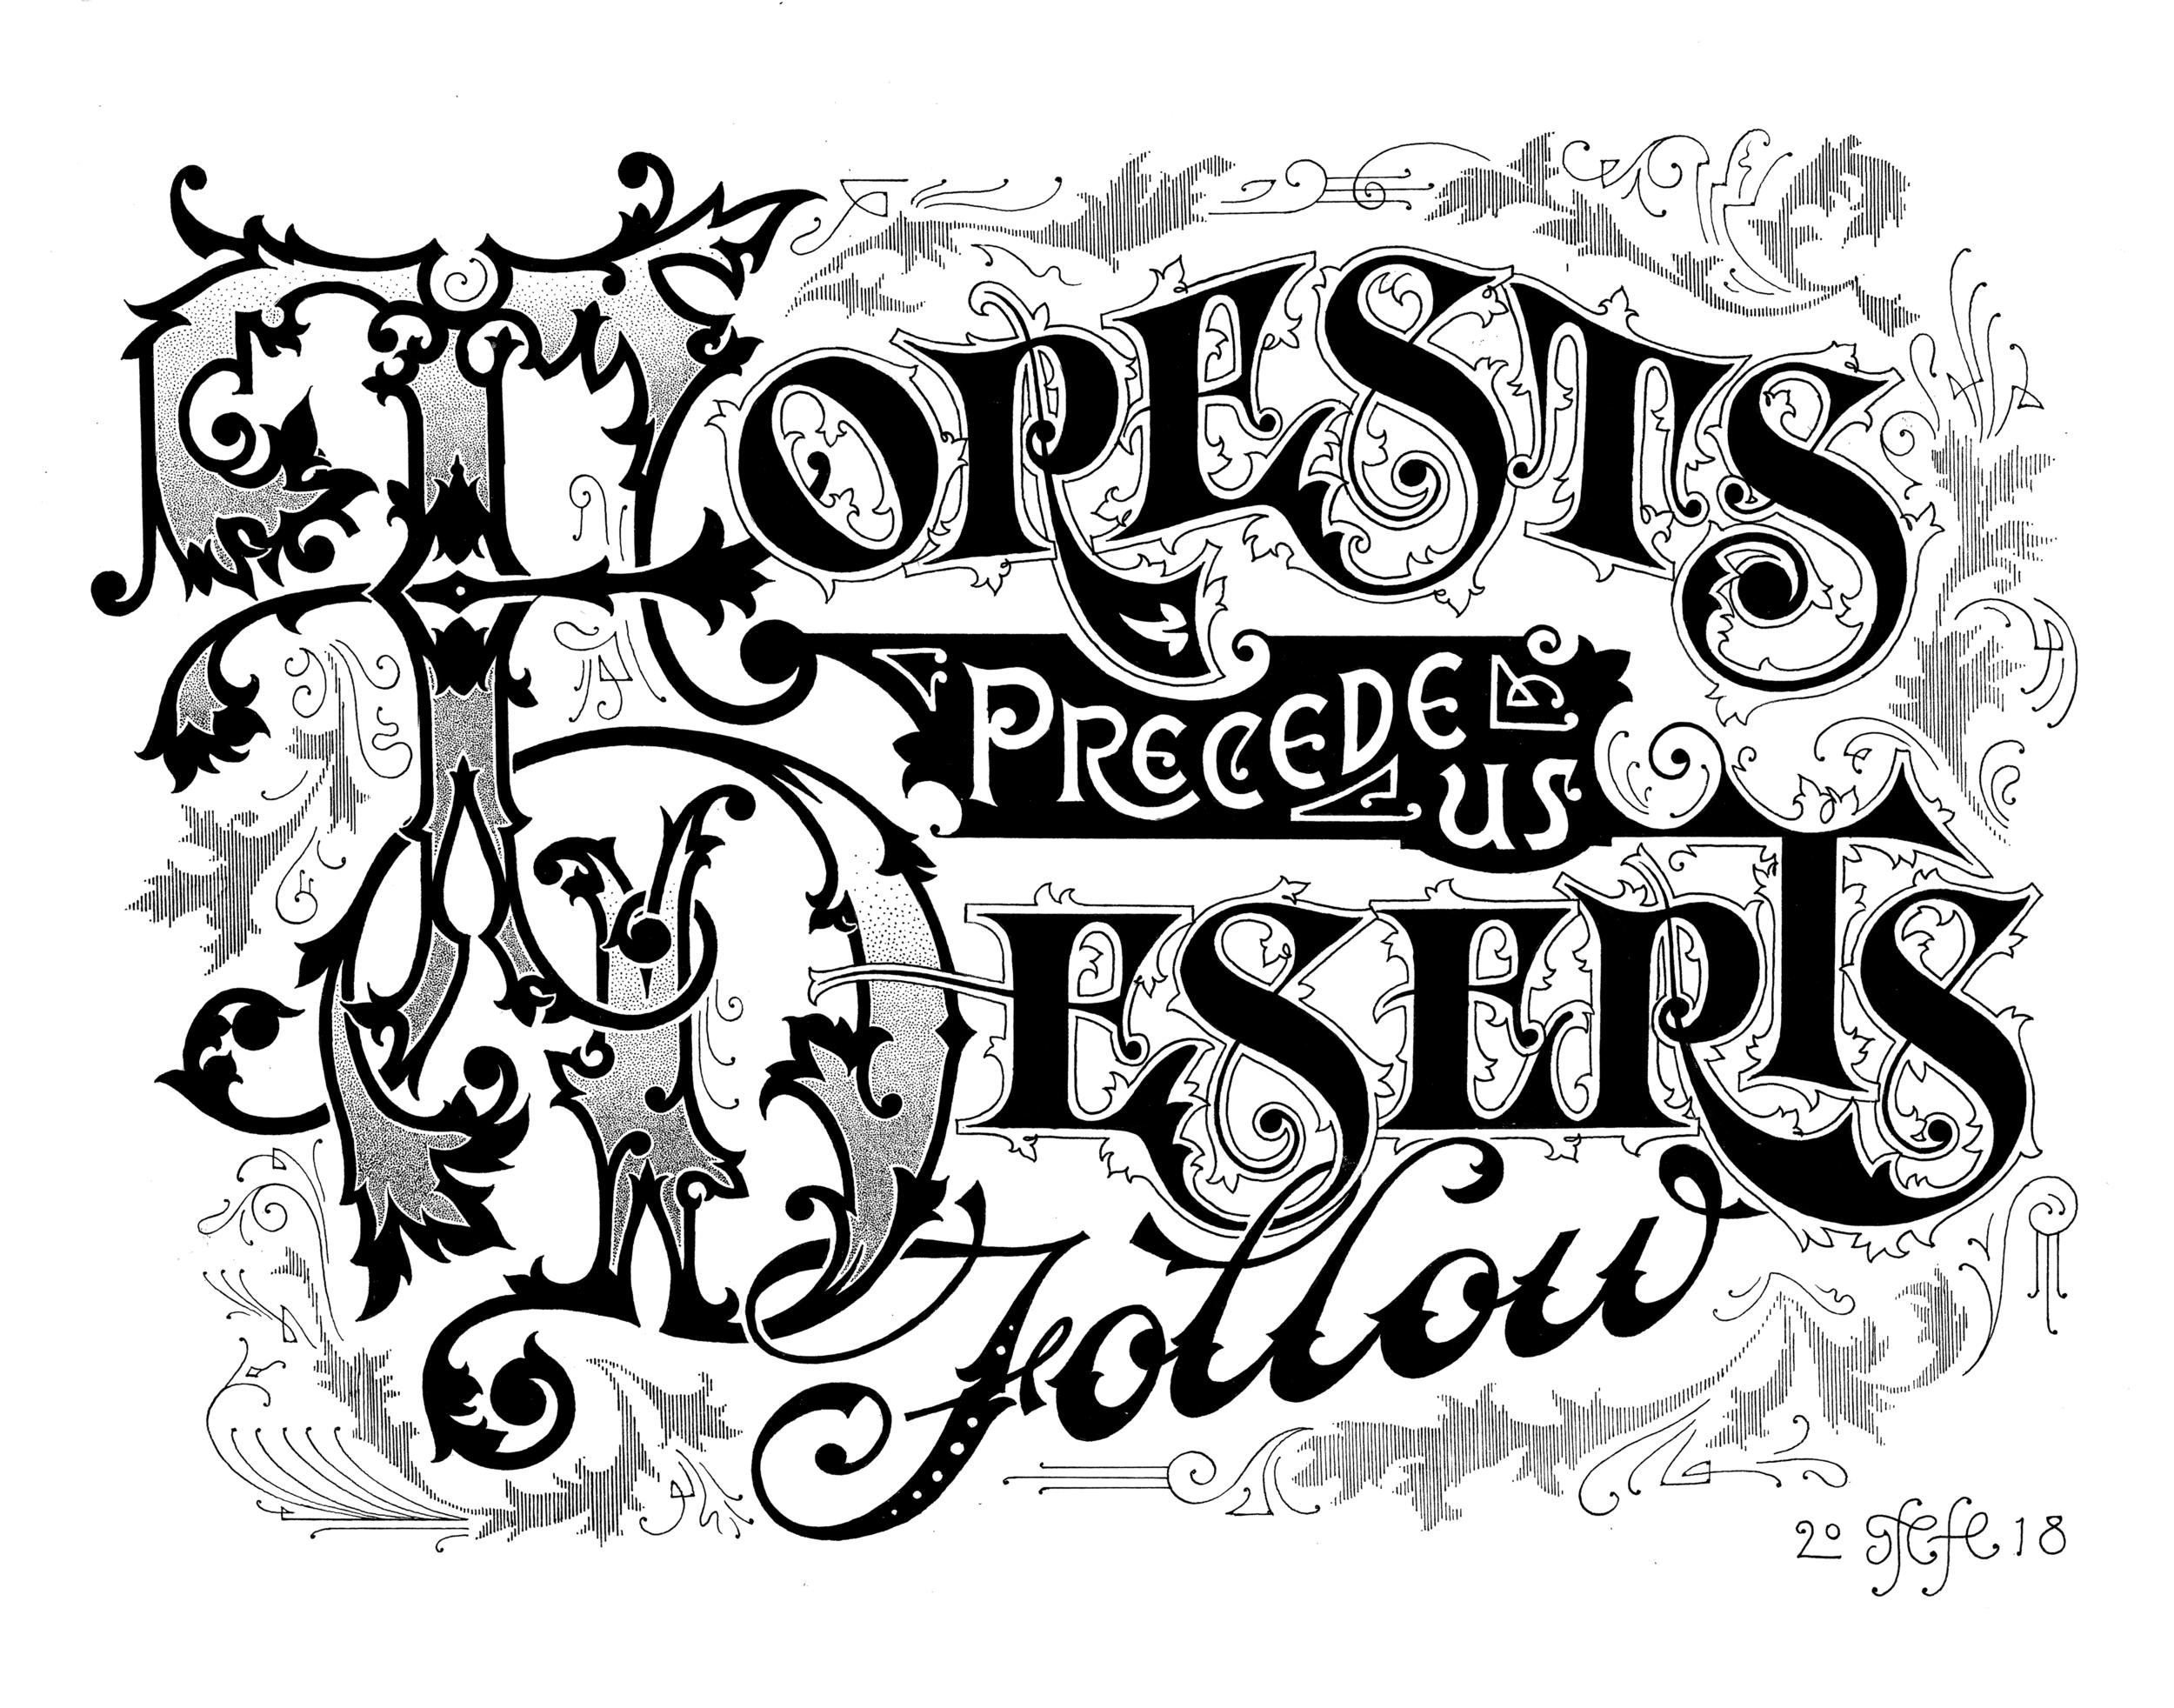 ForestsPrecedeUsDesertsFollow 300ppi.png